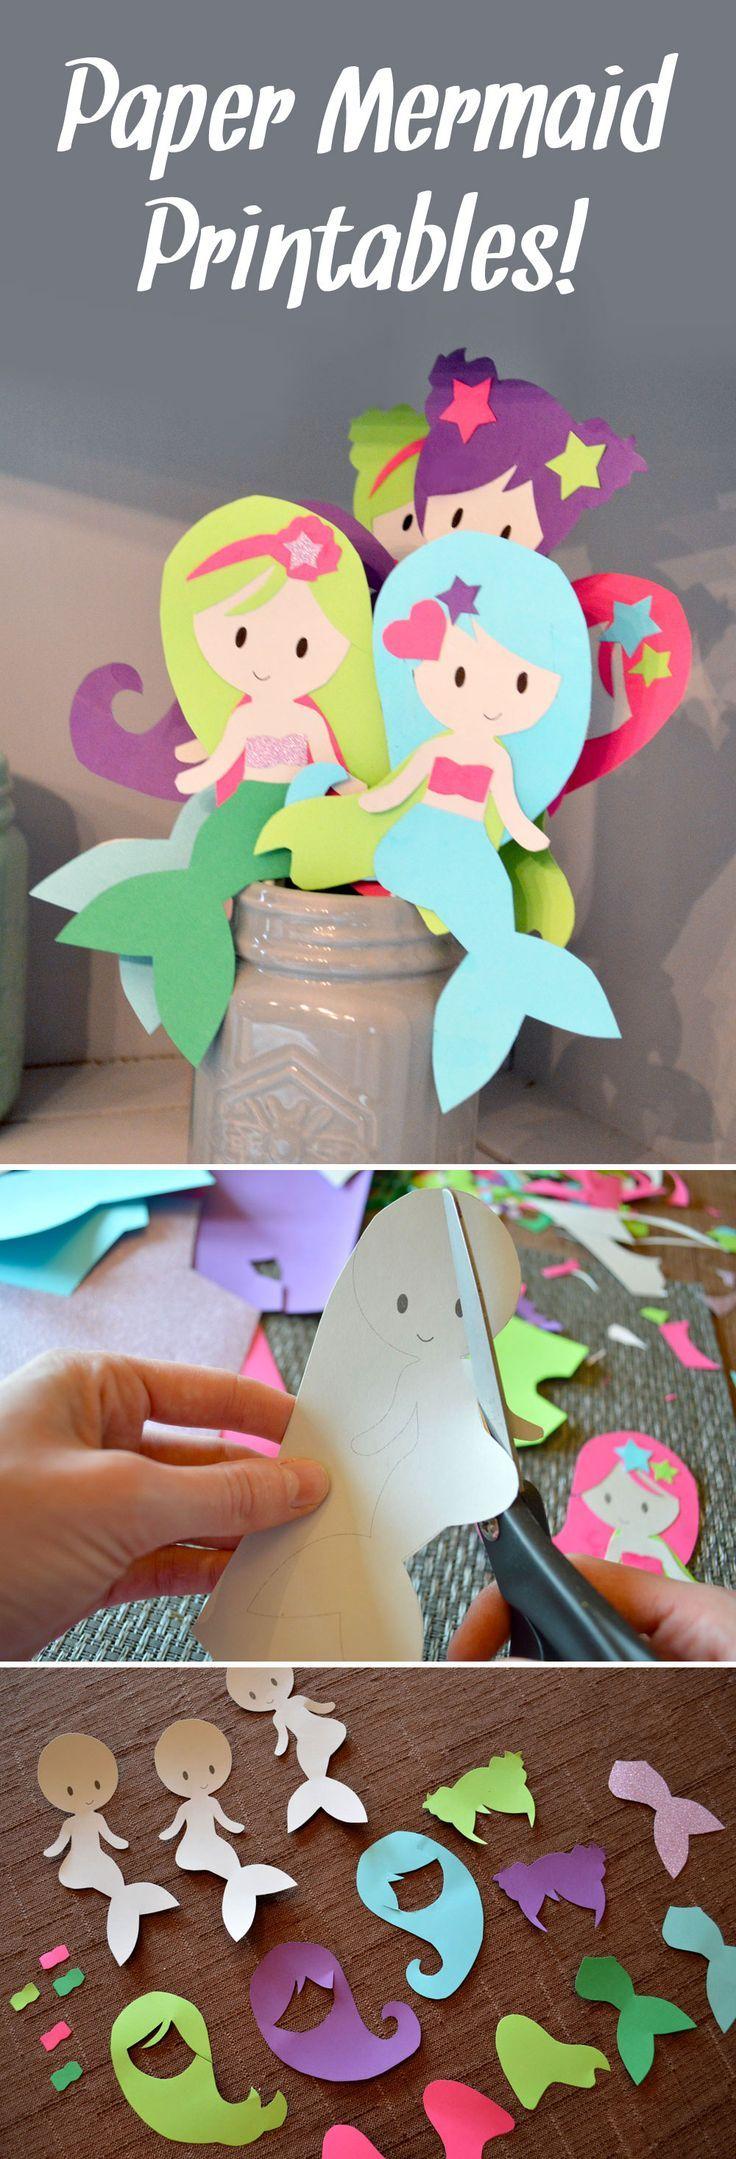 How to plan easy kidsu birthday parties mermaid craft and mermaid